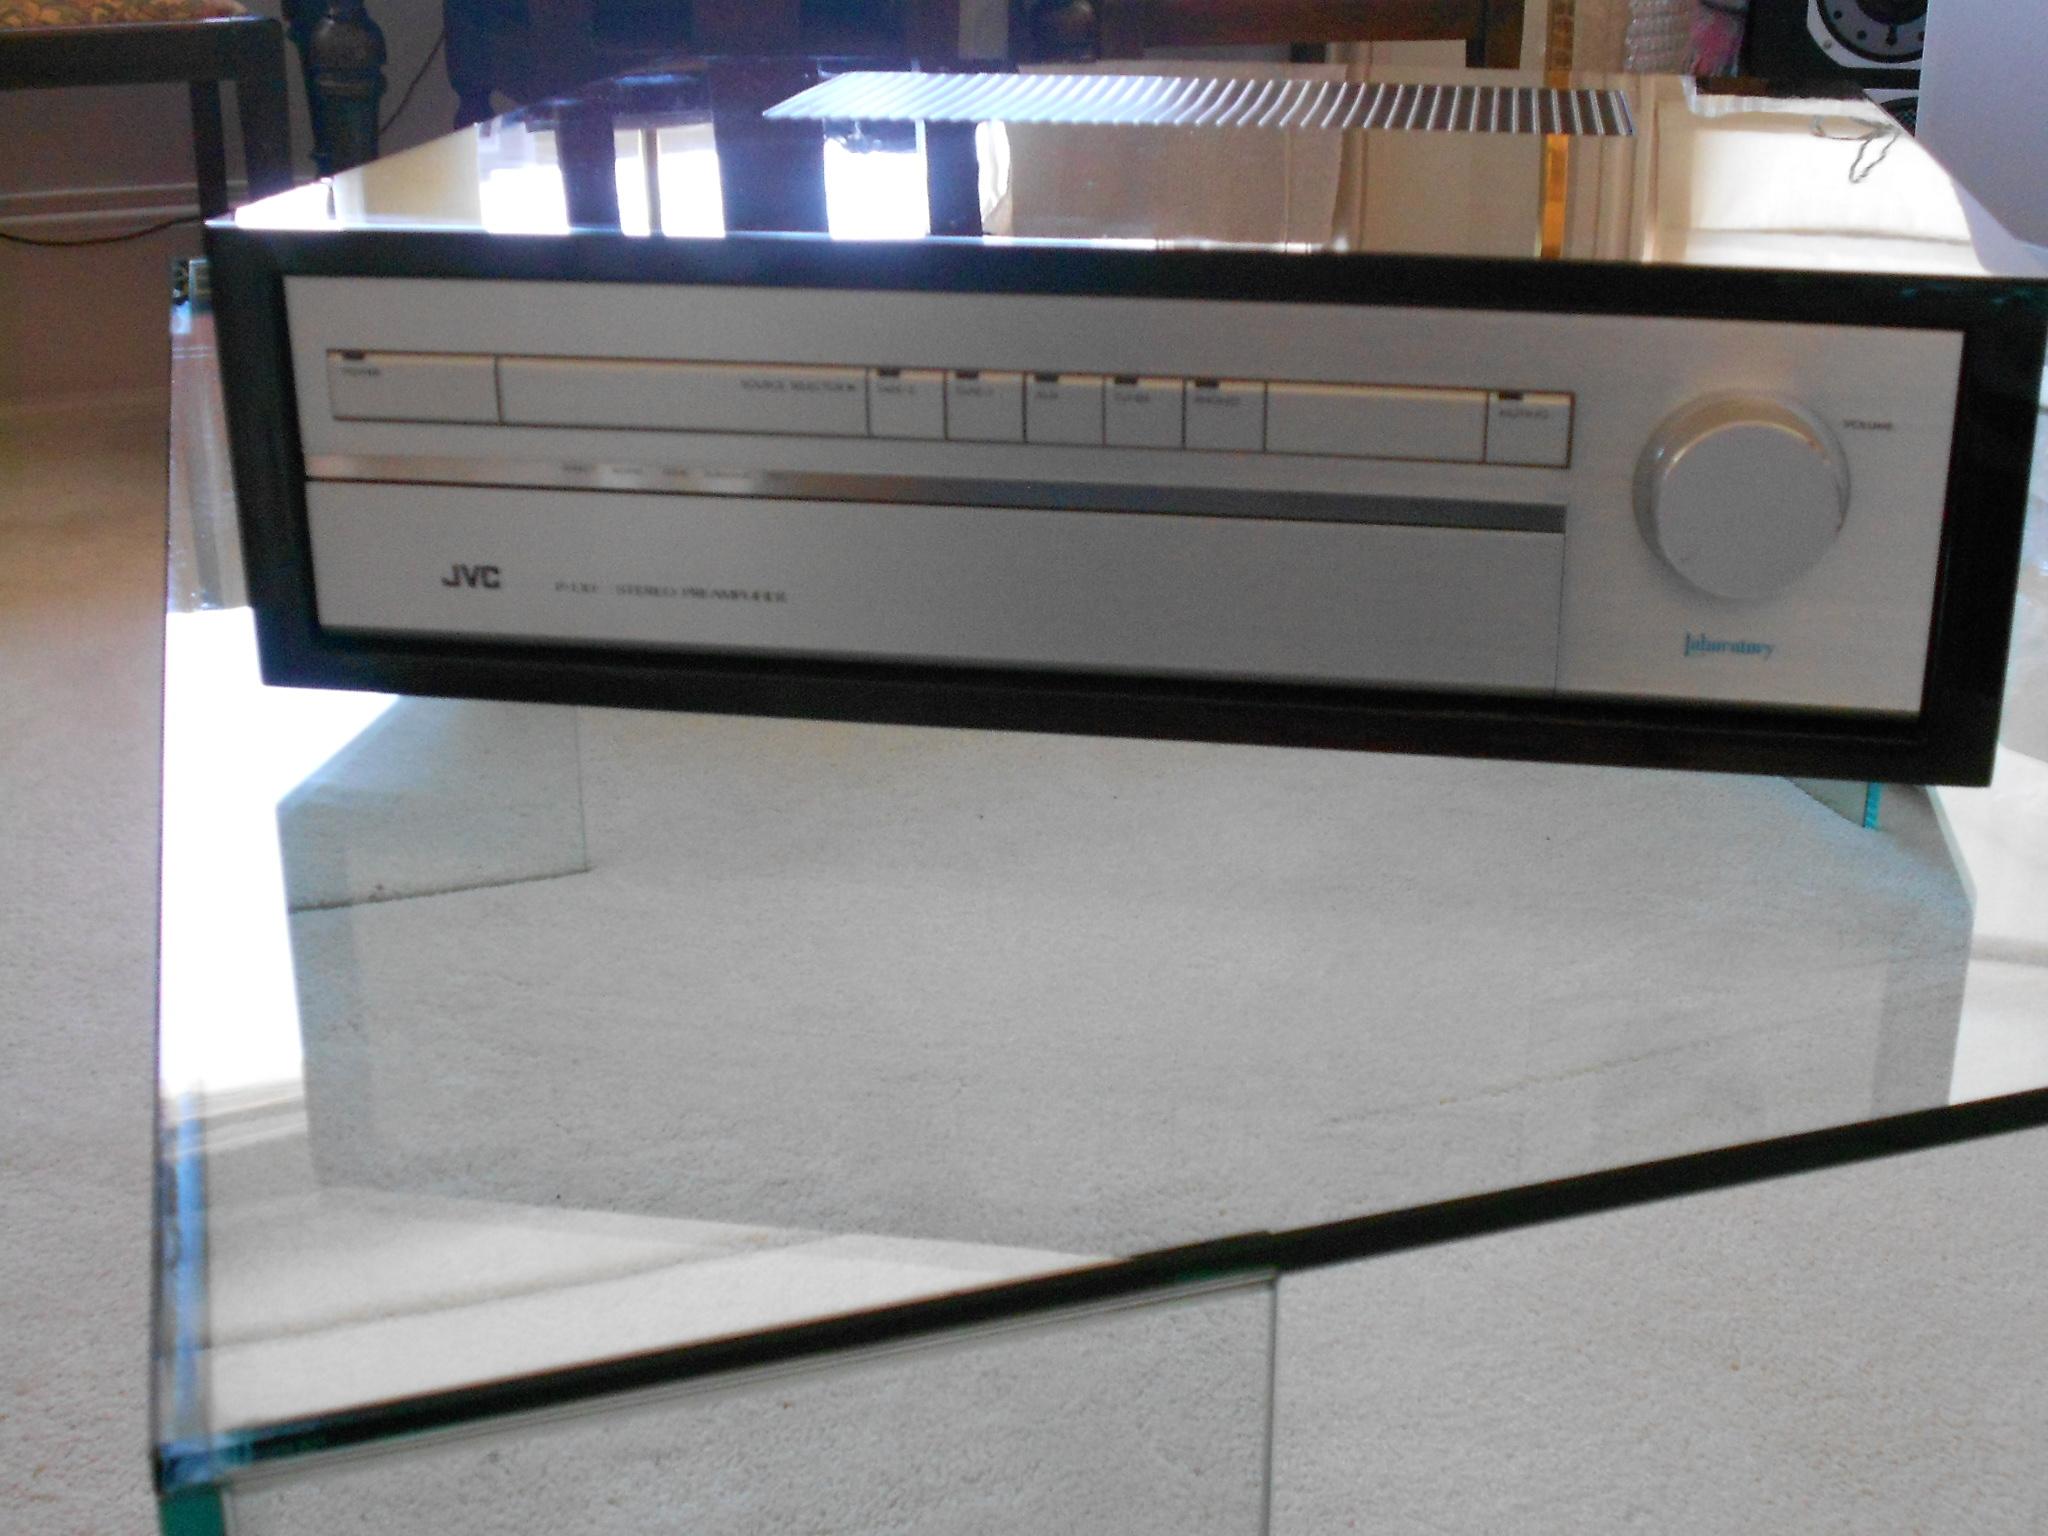 JVC PL-10 pre-amplifier and Sony TA 1120 009.JPG